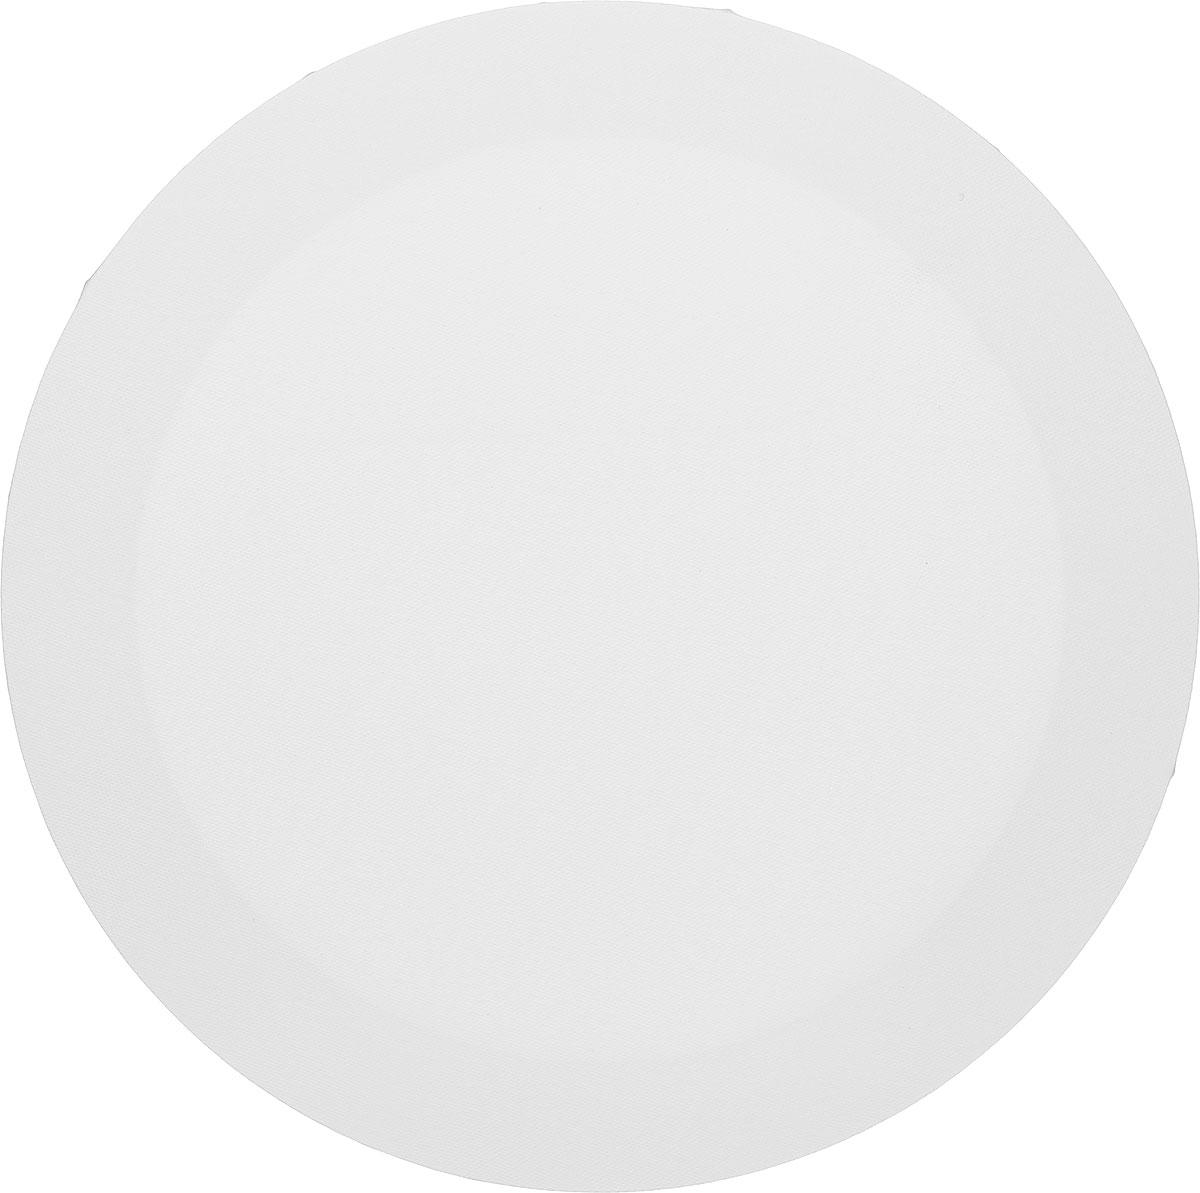 Малевичъ Холст на подрамнике круглый диаметр 40 см 380 г/м2